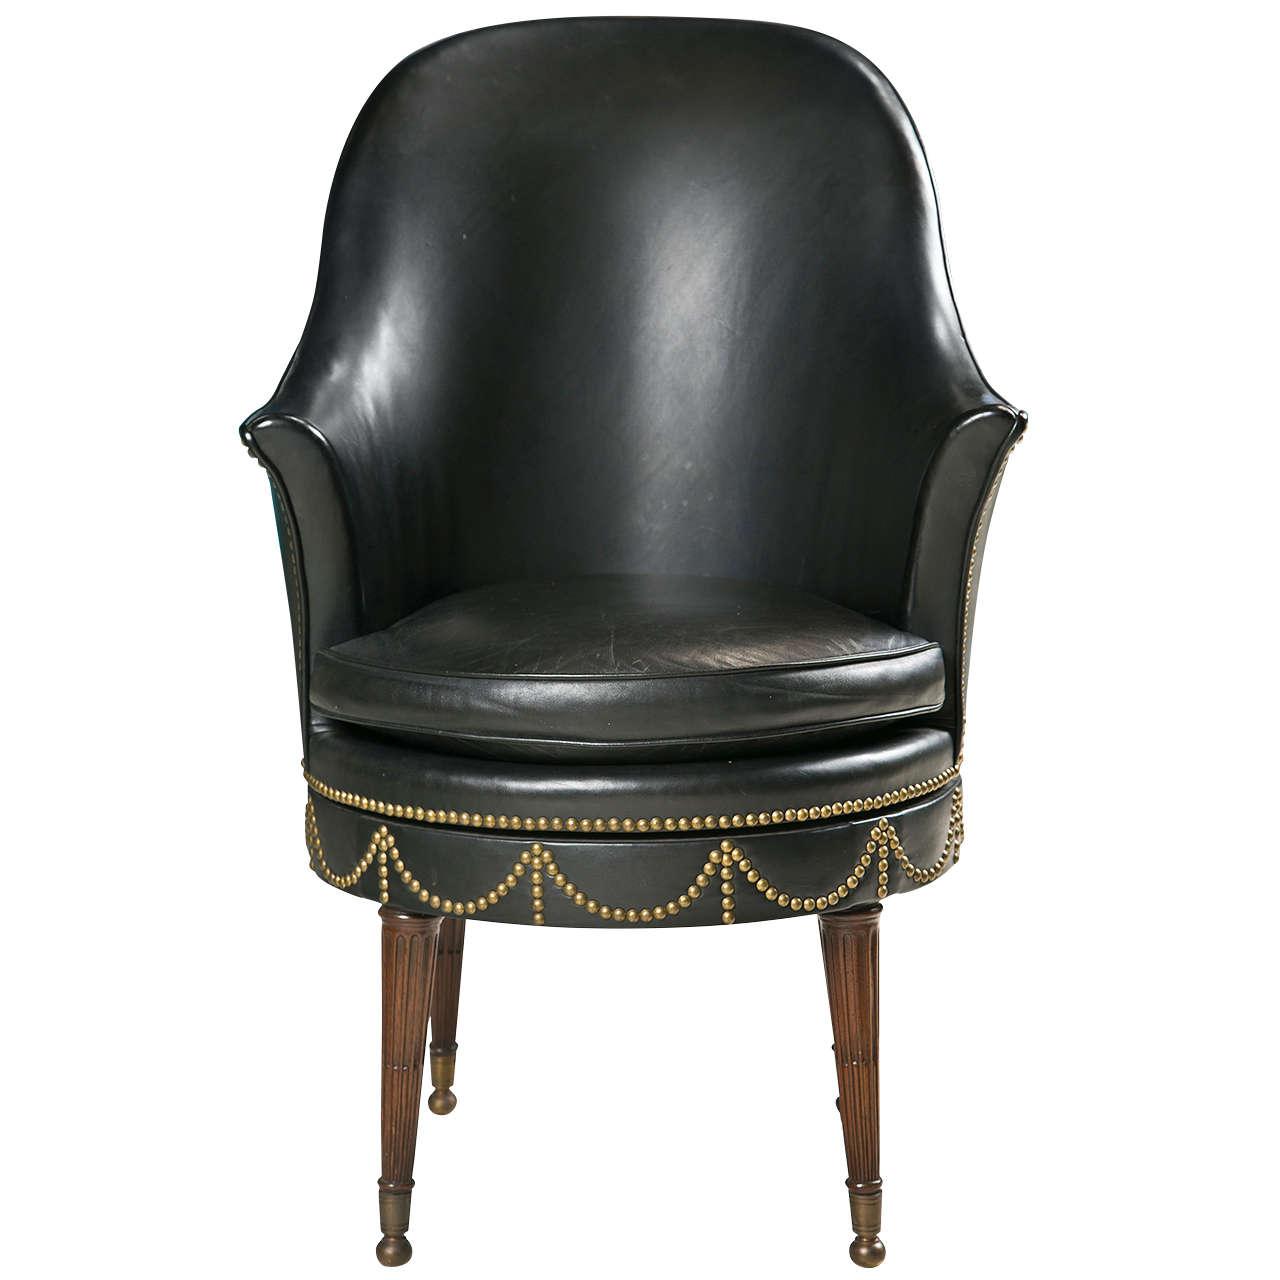 decorative nail heads for furniture. Black Leather Swivel Chair With Decorative Nailheads For Sale Nail Heads Furniture